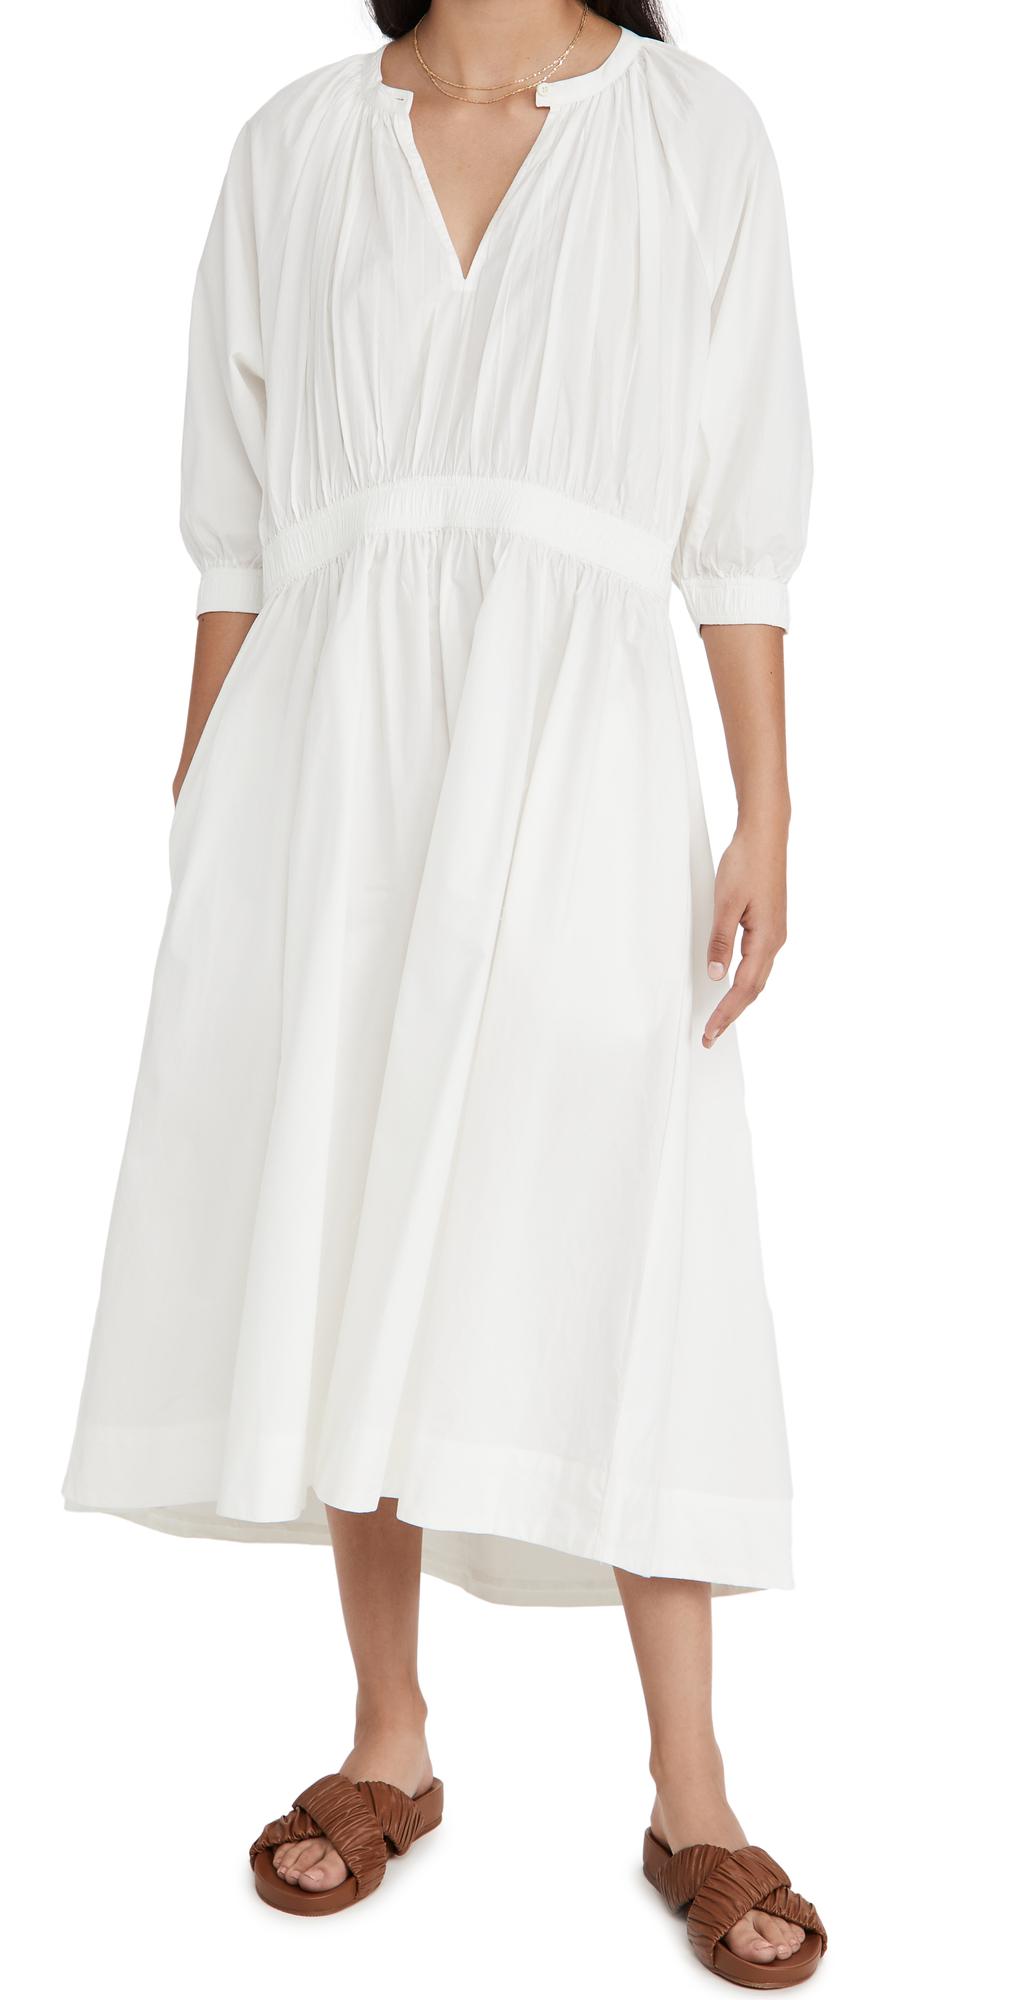 Cobano Dress